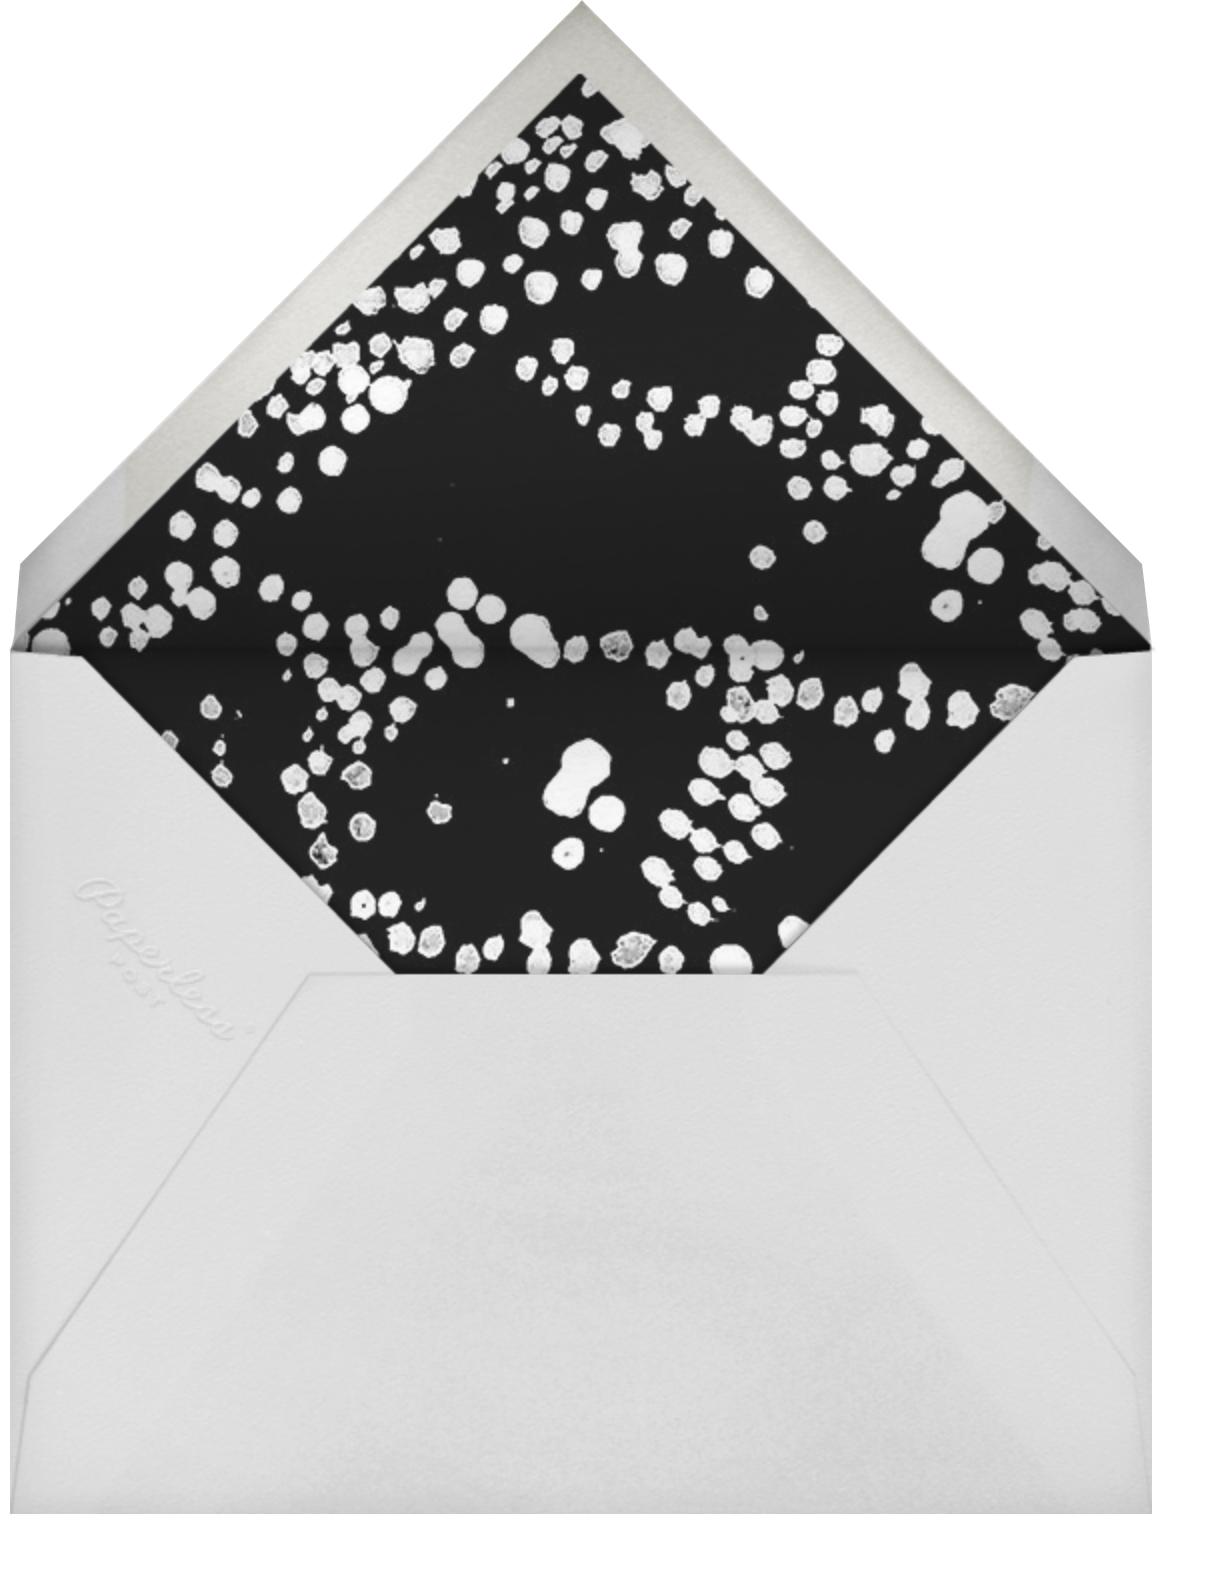 Evoke (Tall) - Black/Gold - Kelly Wearstler - Company holiday party - envelope back